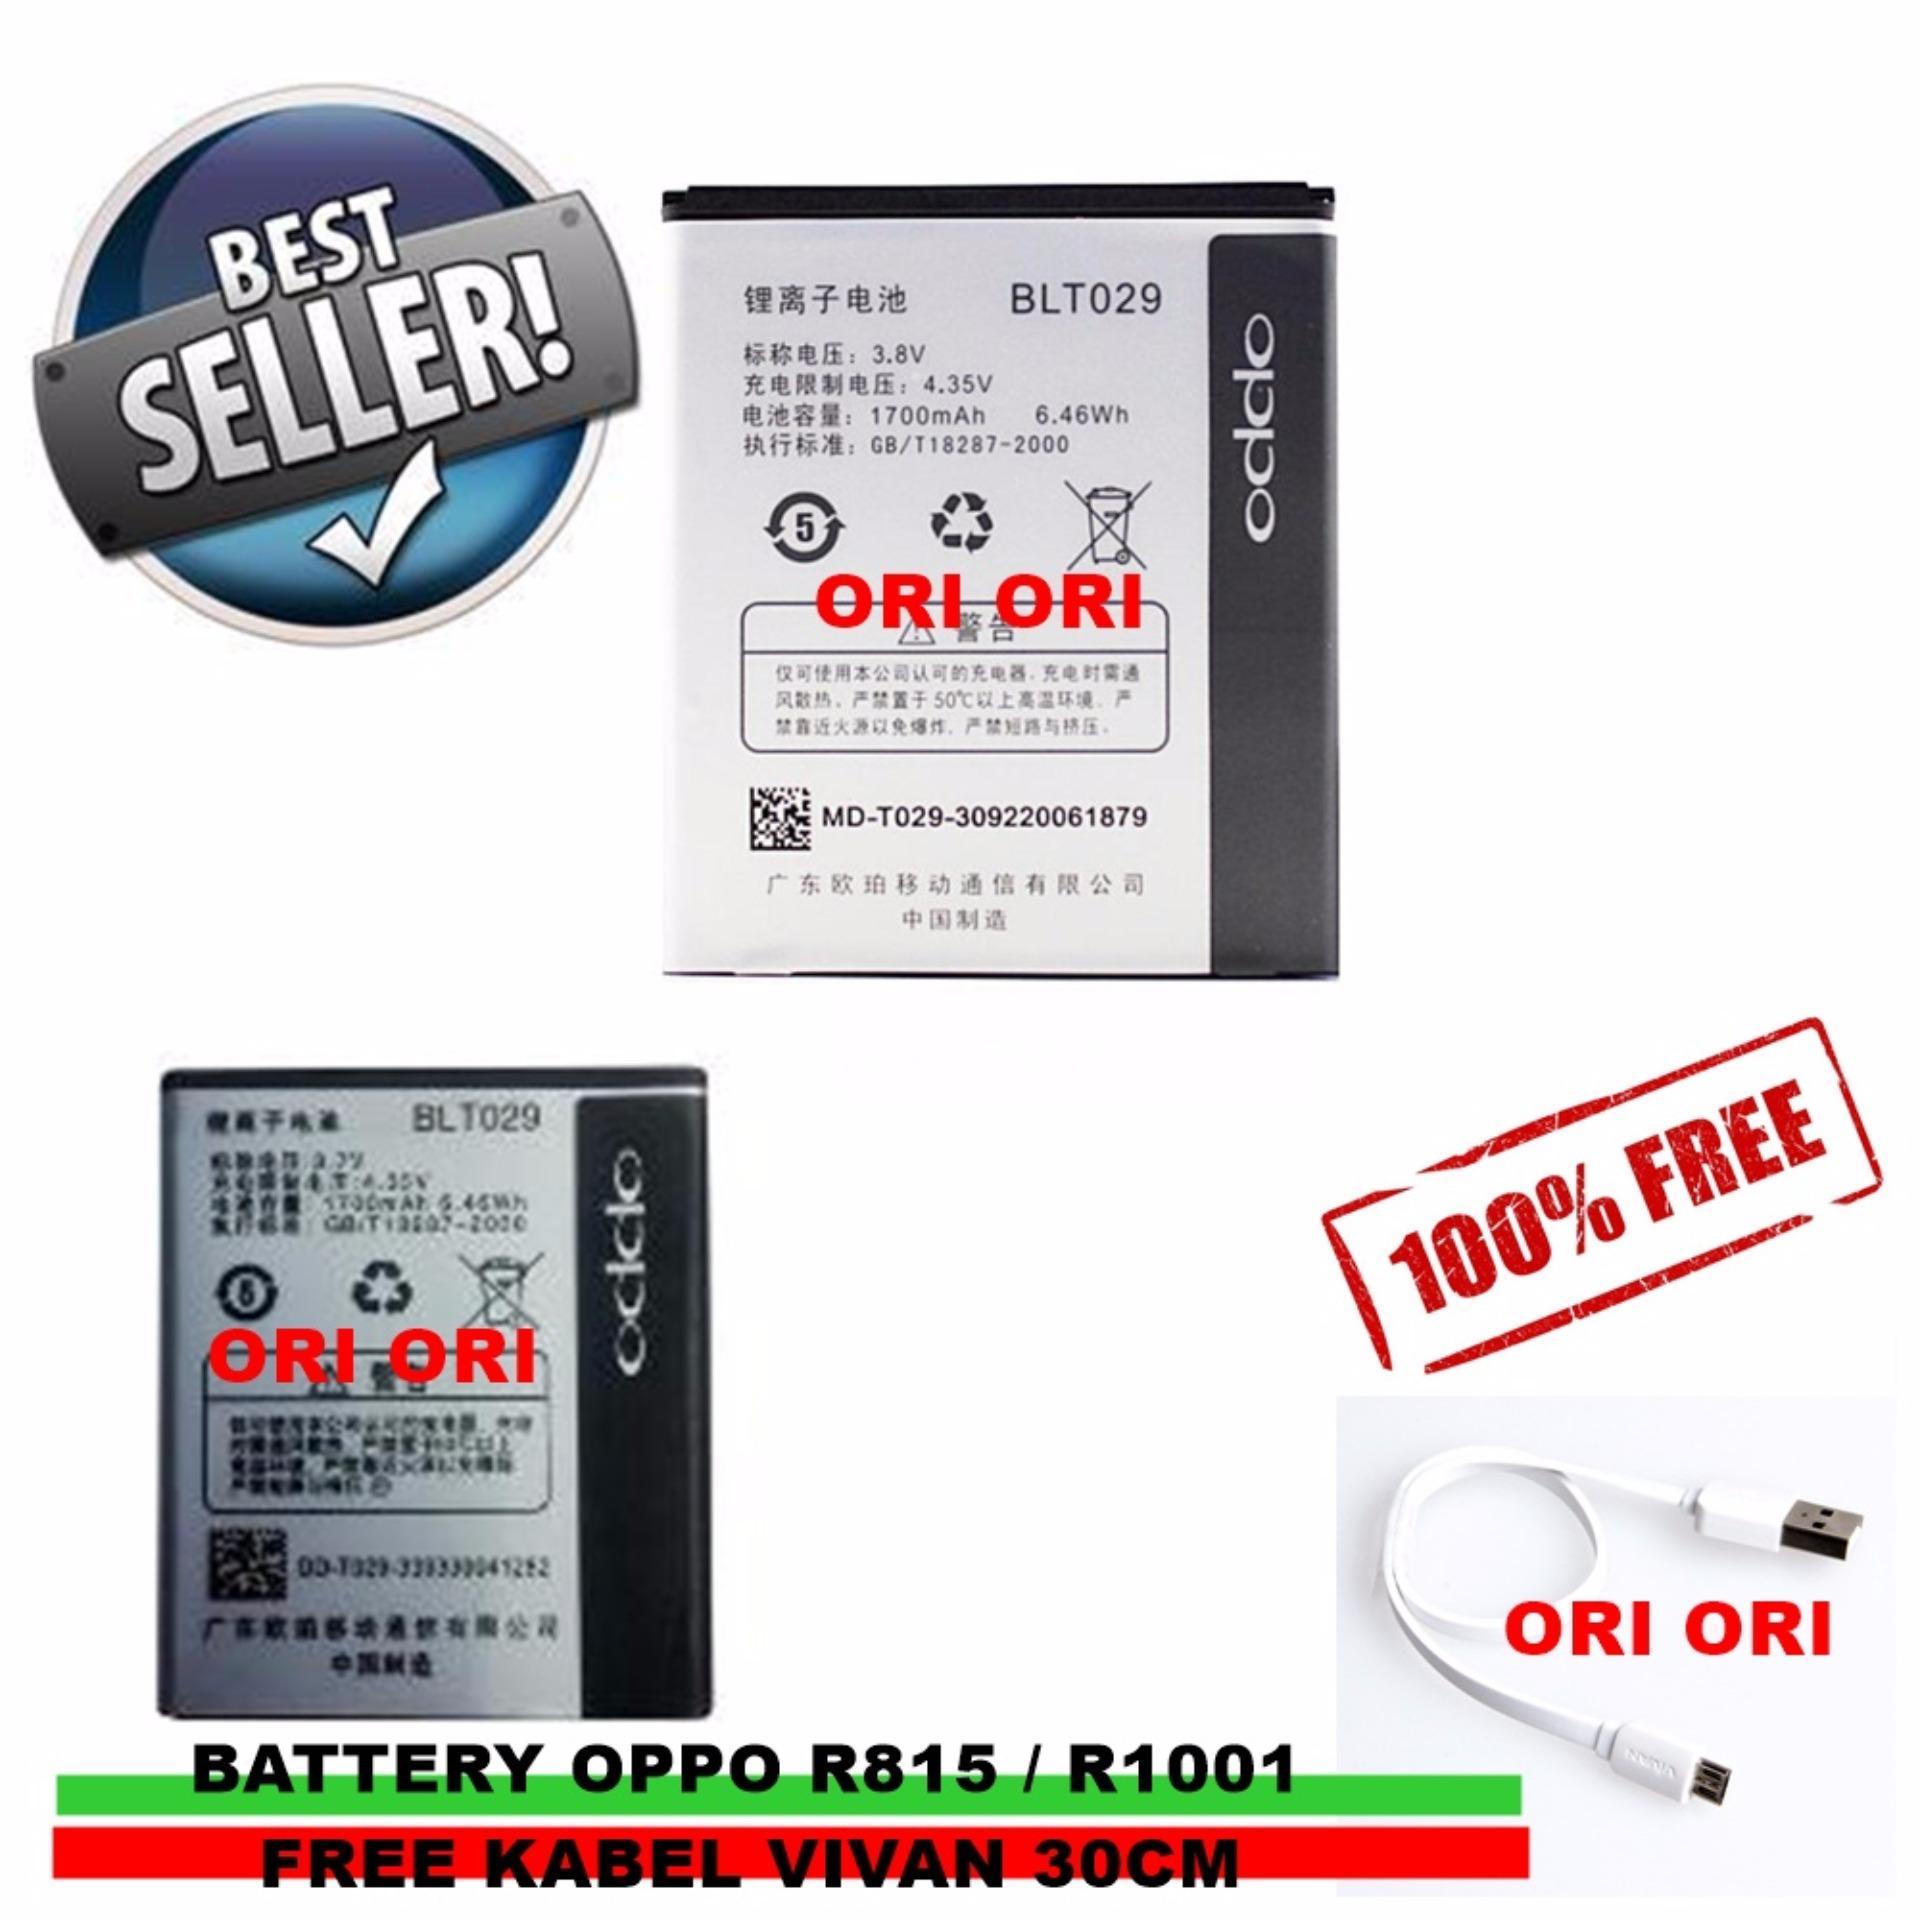 Oppo Baterai BLT 029 For OPPO R815 Clover /R1001 /Muse R821 .